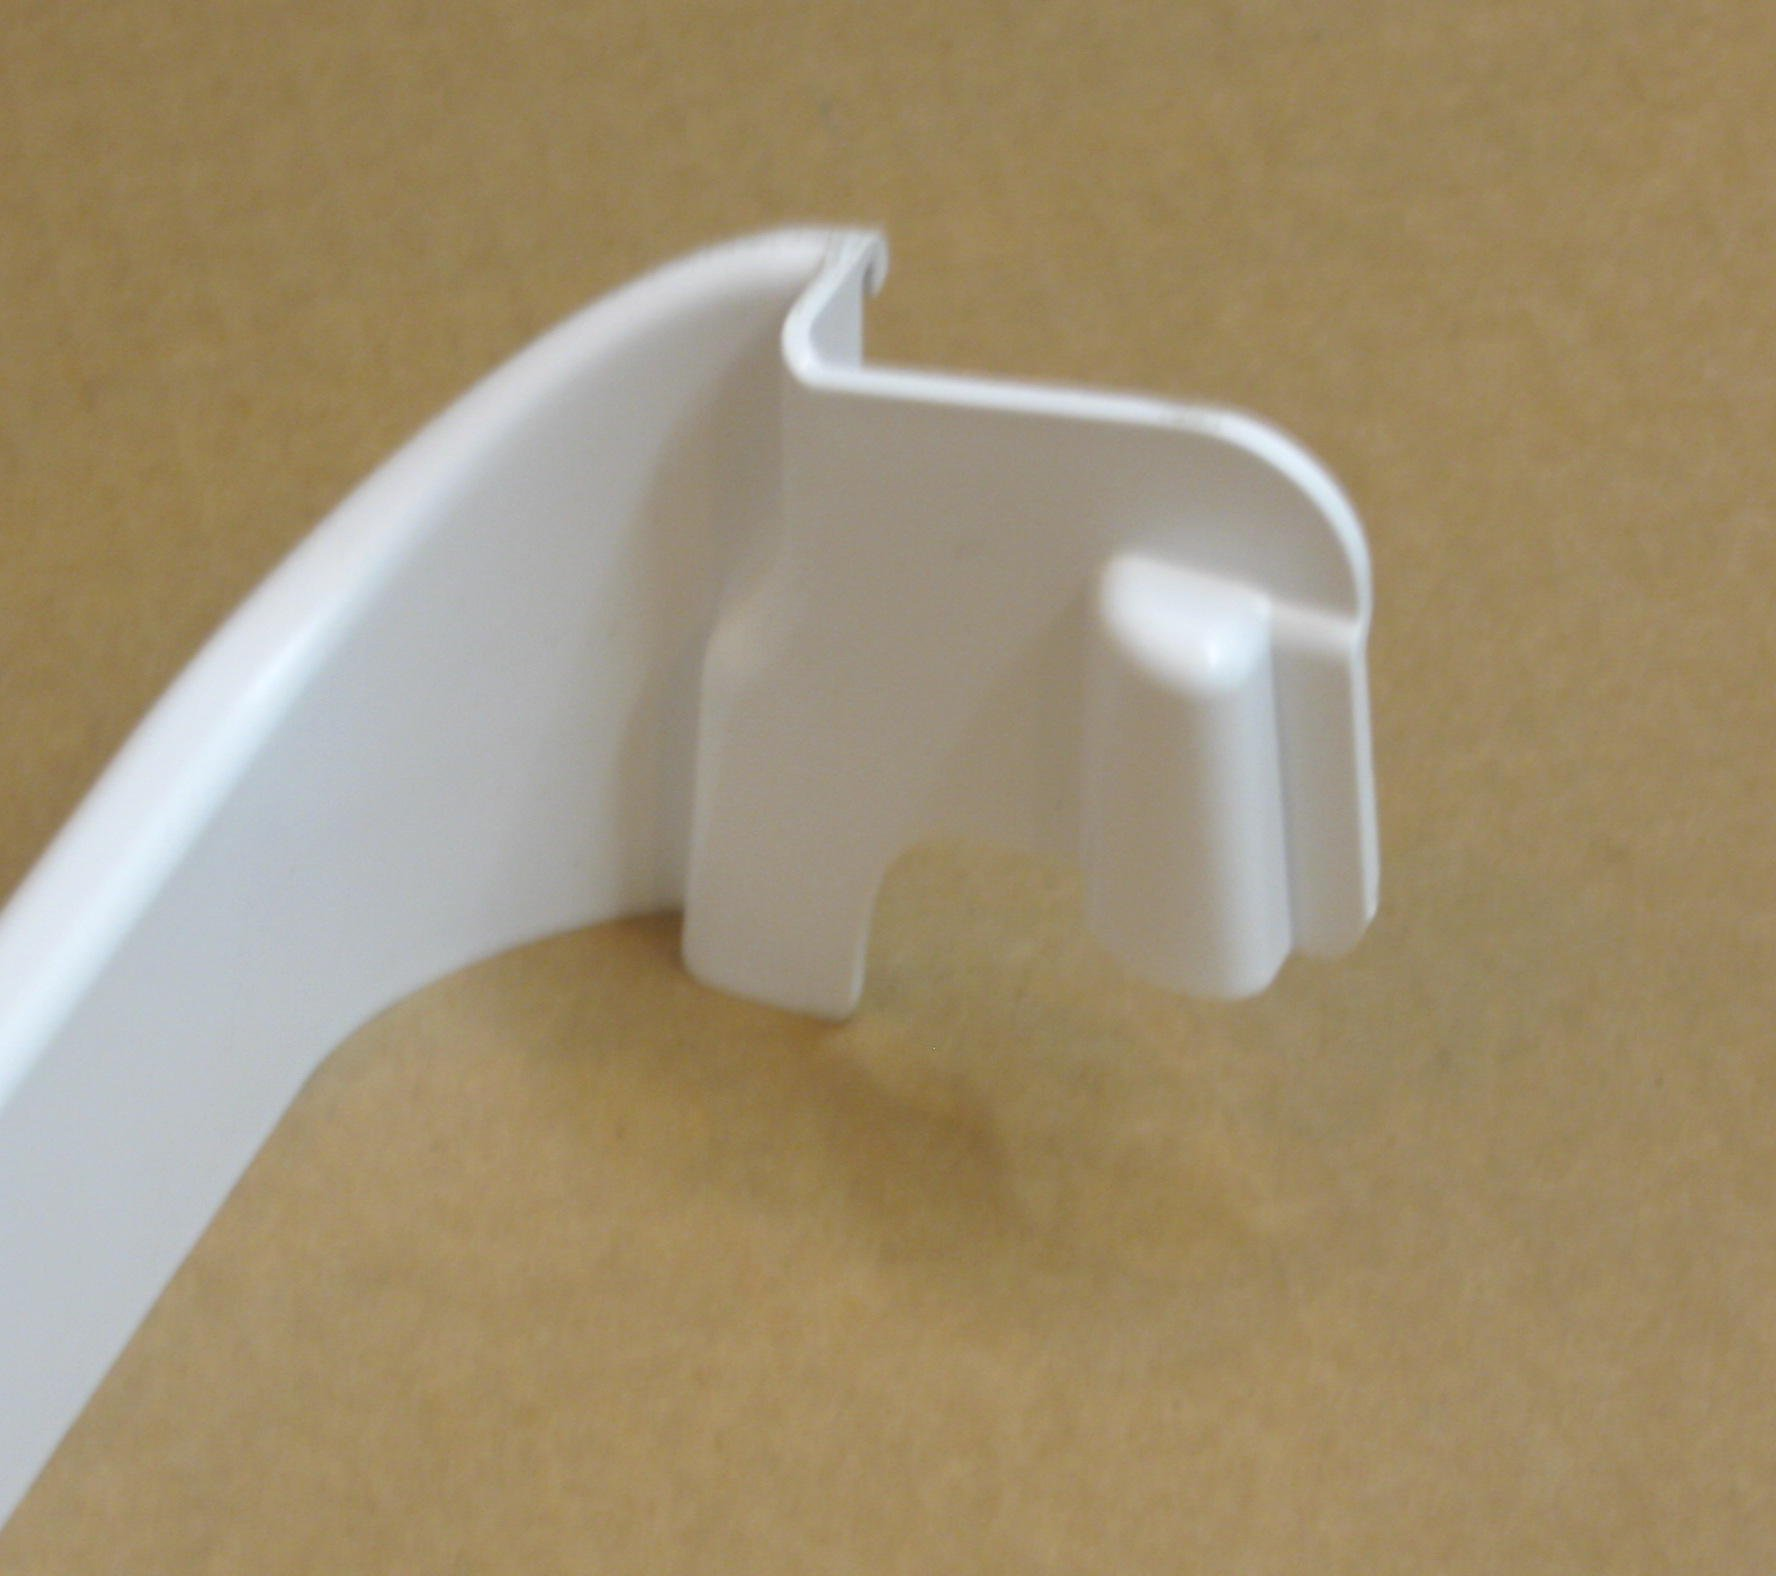 (RB) Refrigerator Door Bar Rack 240534901 AP3214630 PS734935 for Electrolux Frigidaire